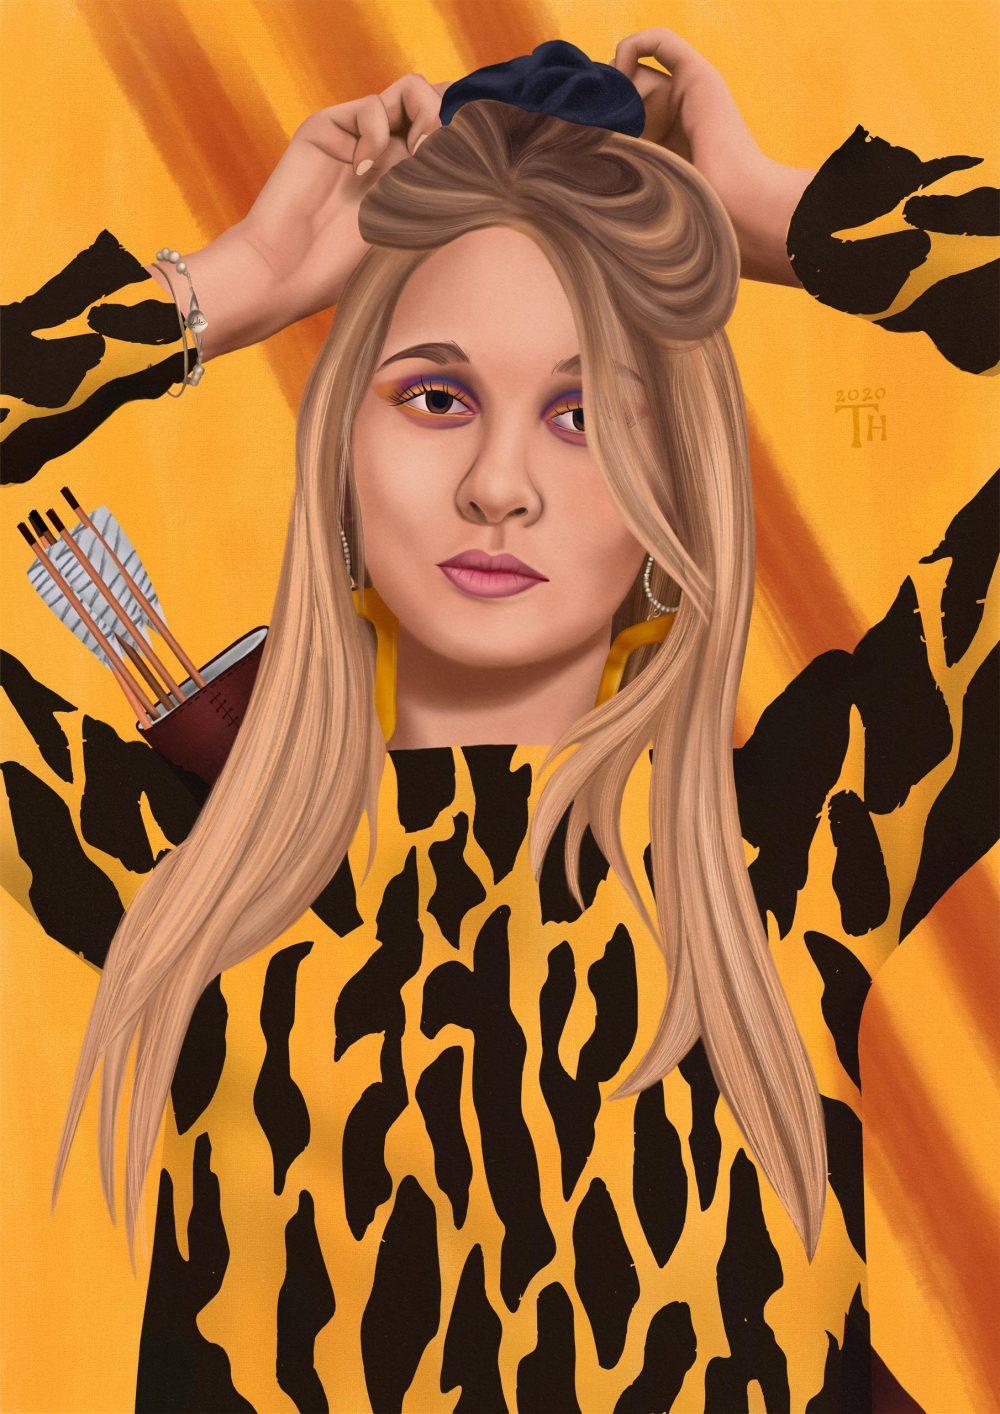 Lolita Jungle - Digital Painting - Thibault Herlédan